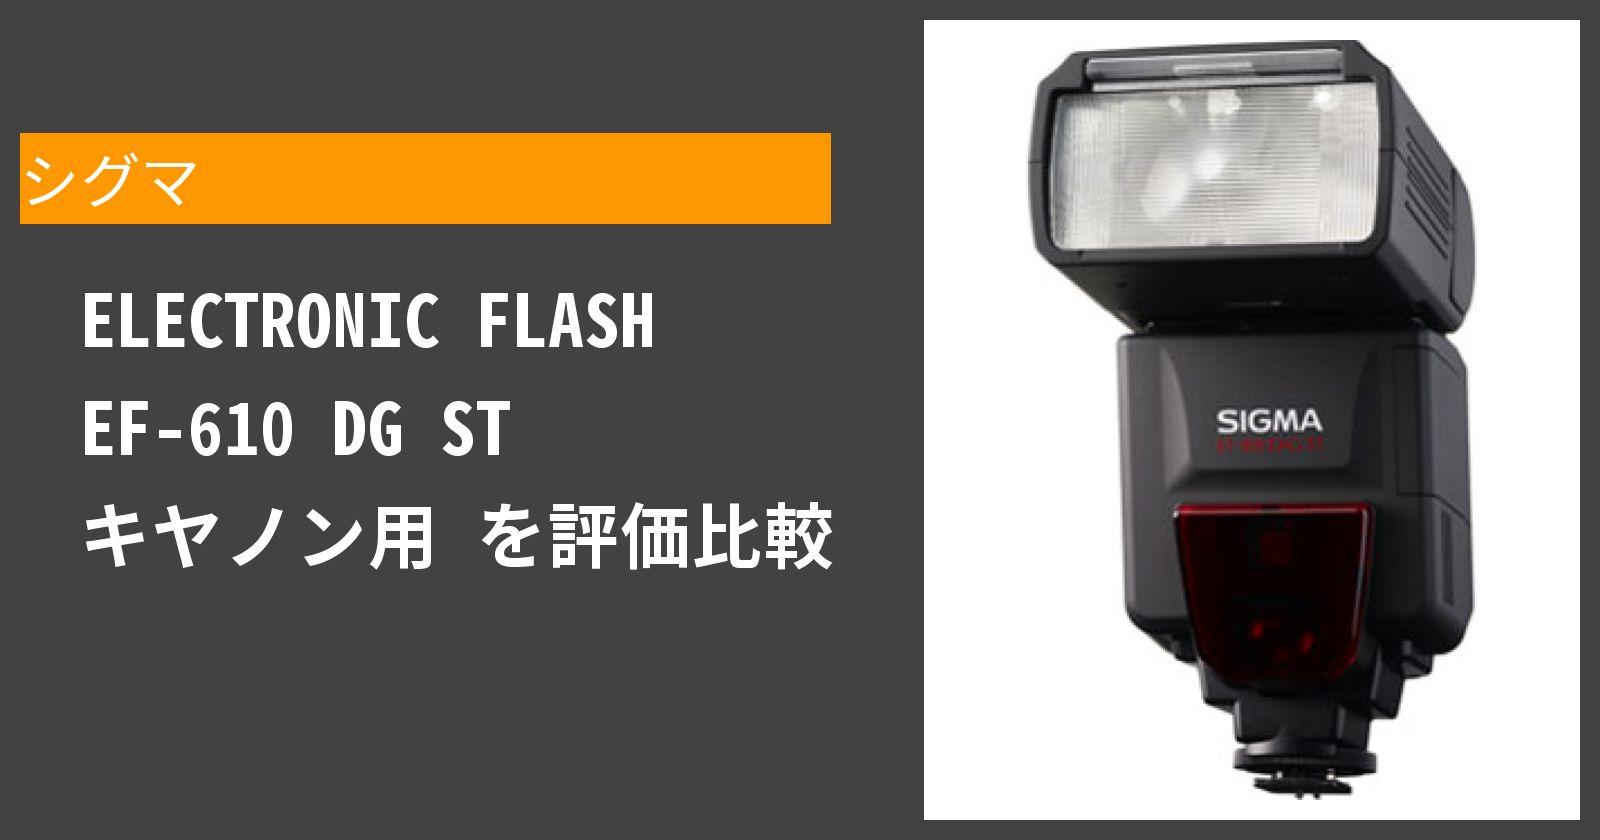 ELECTRONIC FLASH EF-610 DG ST キヤノン用を徹底評価